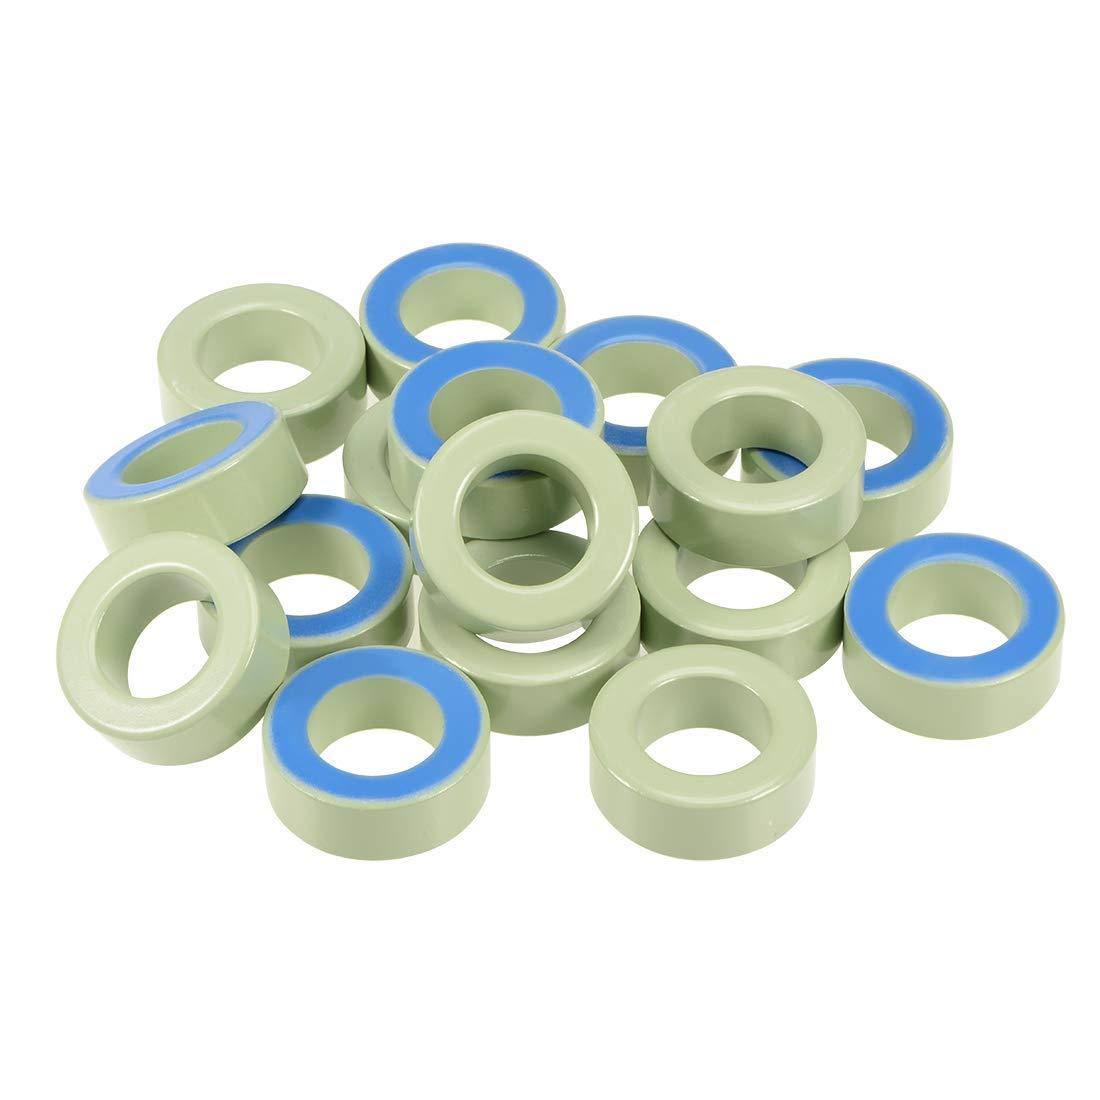 ZCHXD Toroid Core, Ferrite Chokes Ring Iron Powder Inductor Ferrite Rings, Light Green Blue 16pcs, 26.9 x 45 x 16.8mm